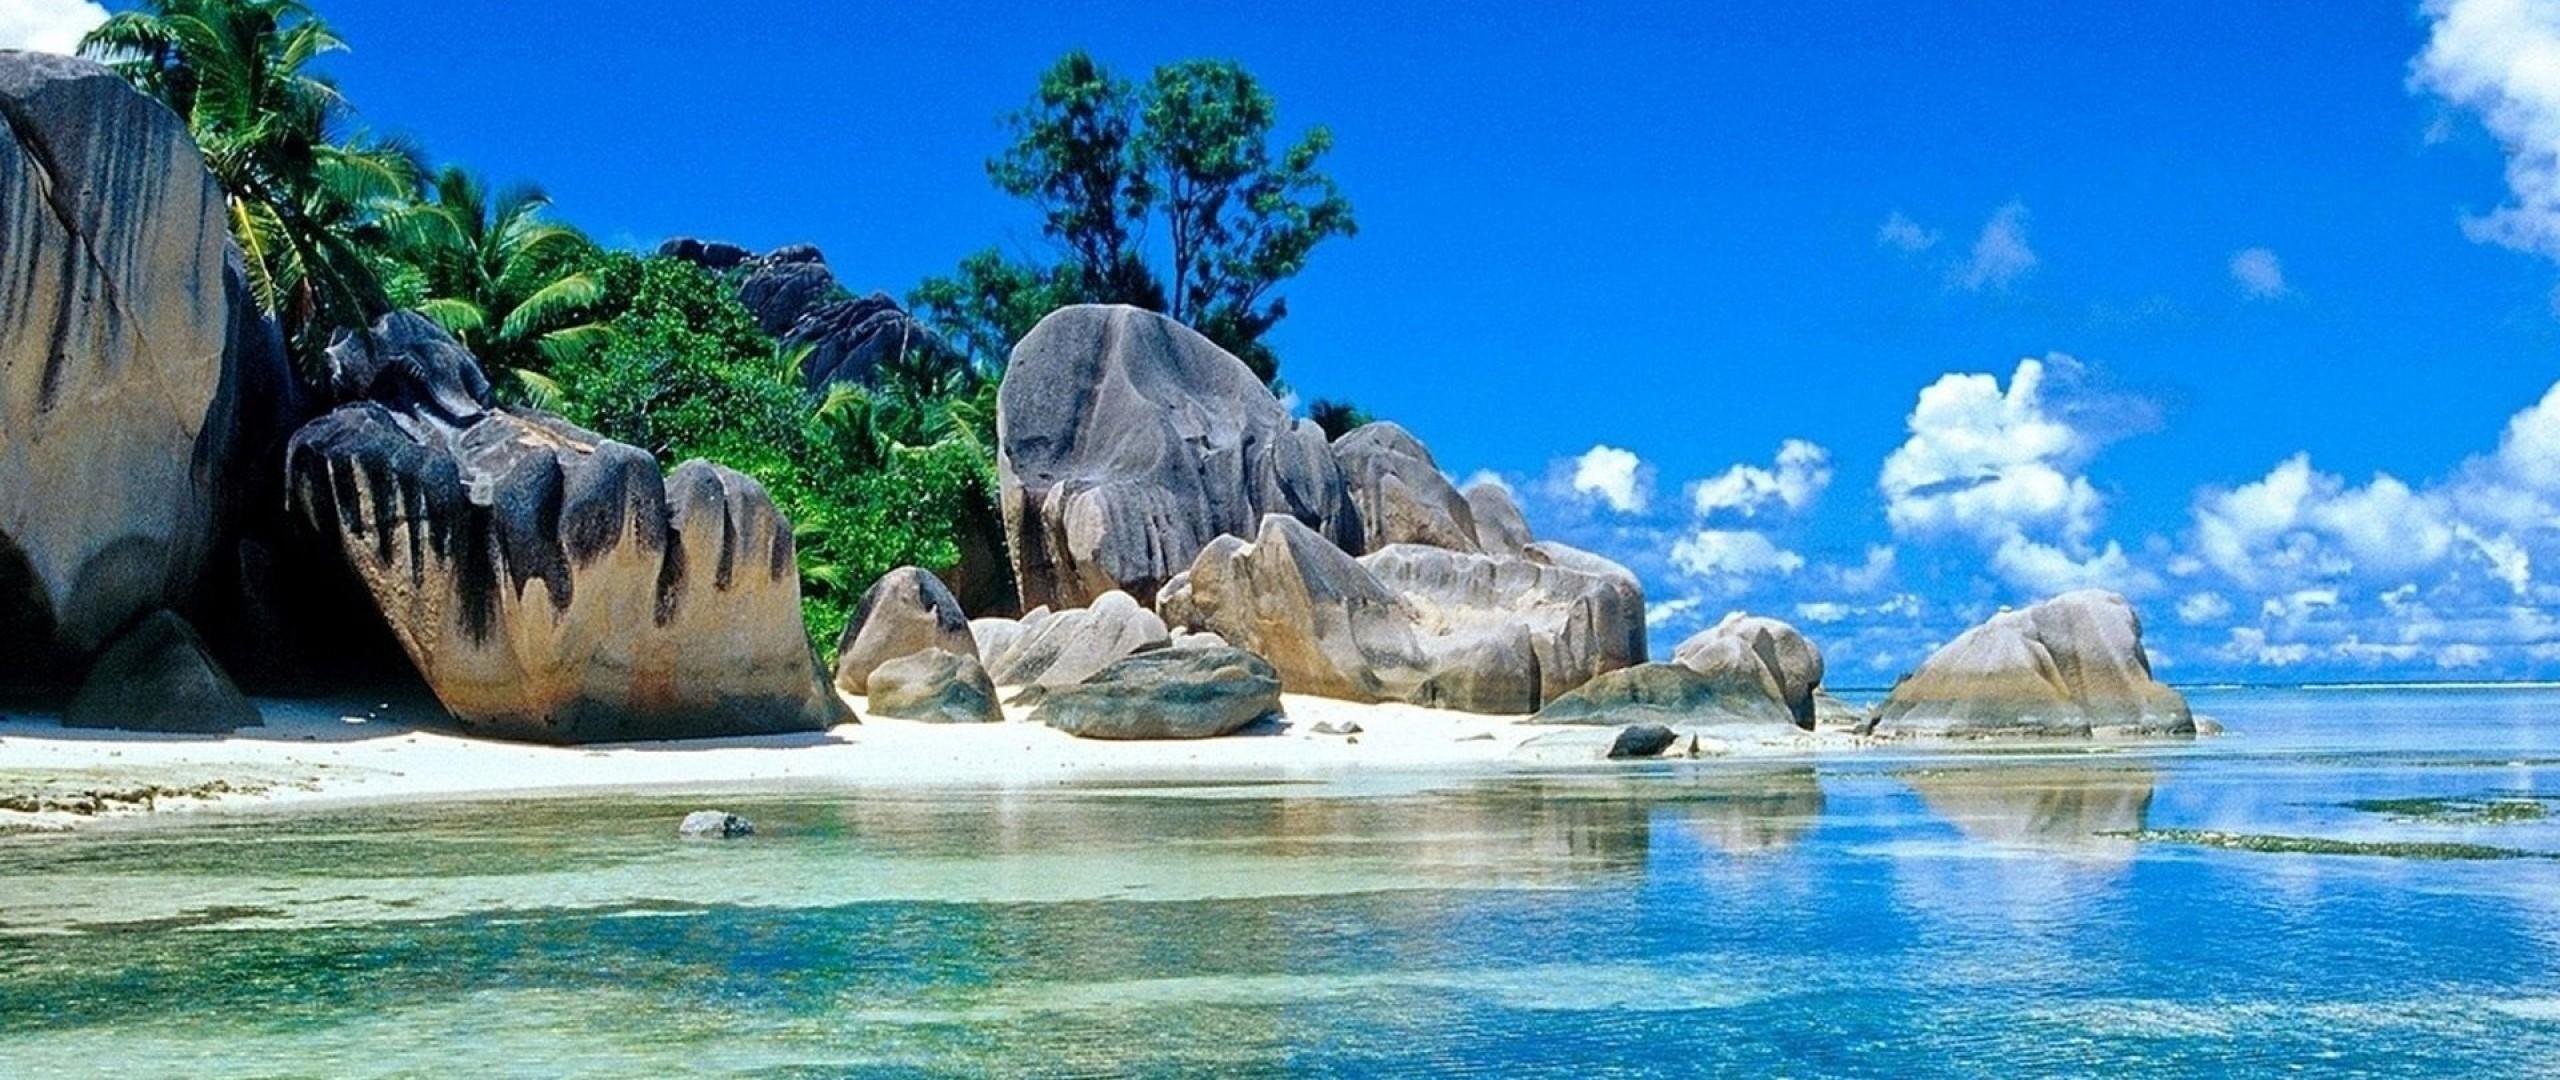 Download 2560x1080 Anse Source Dargent Seychelles La Digue Island Nature